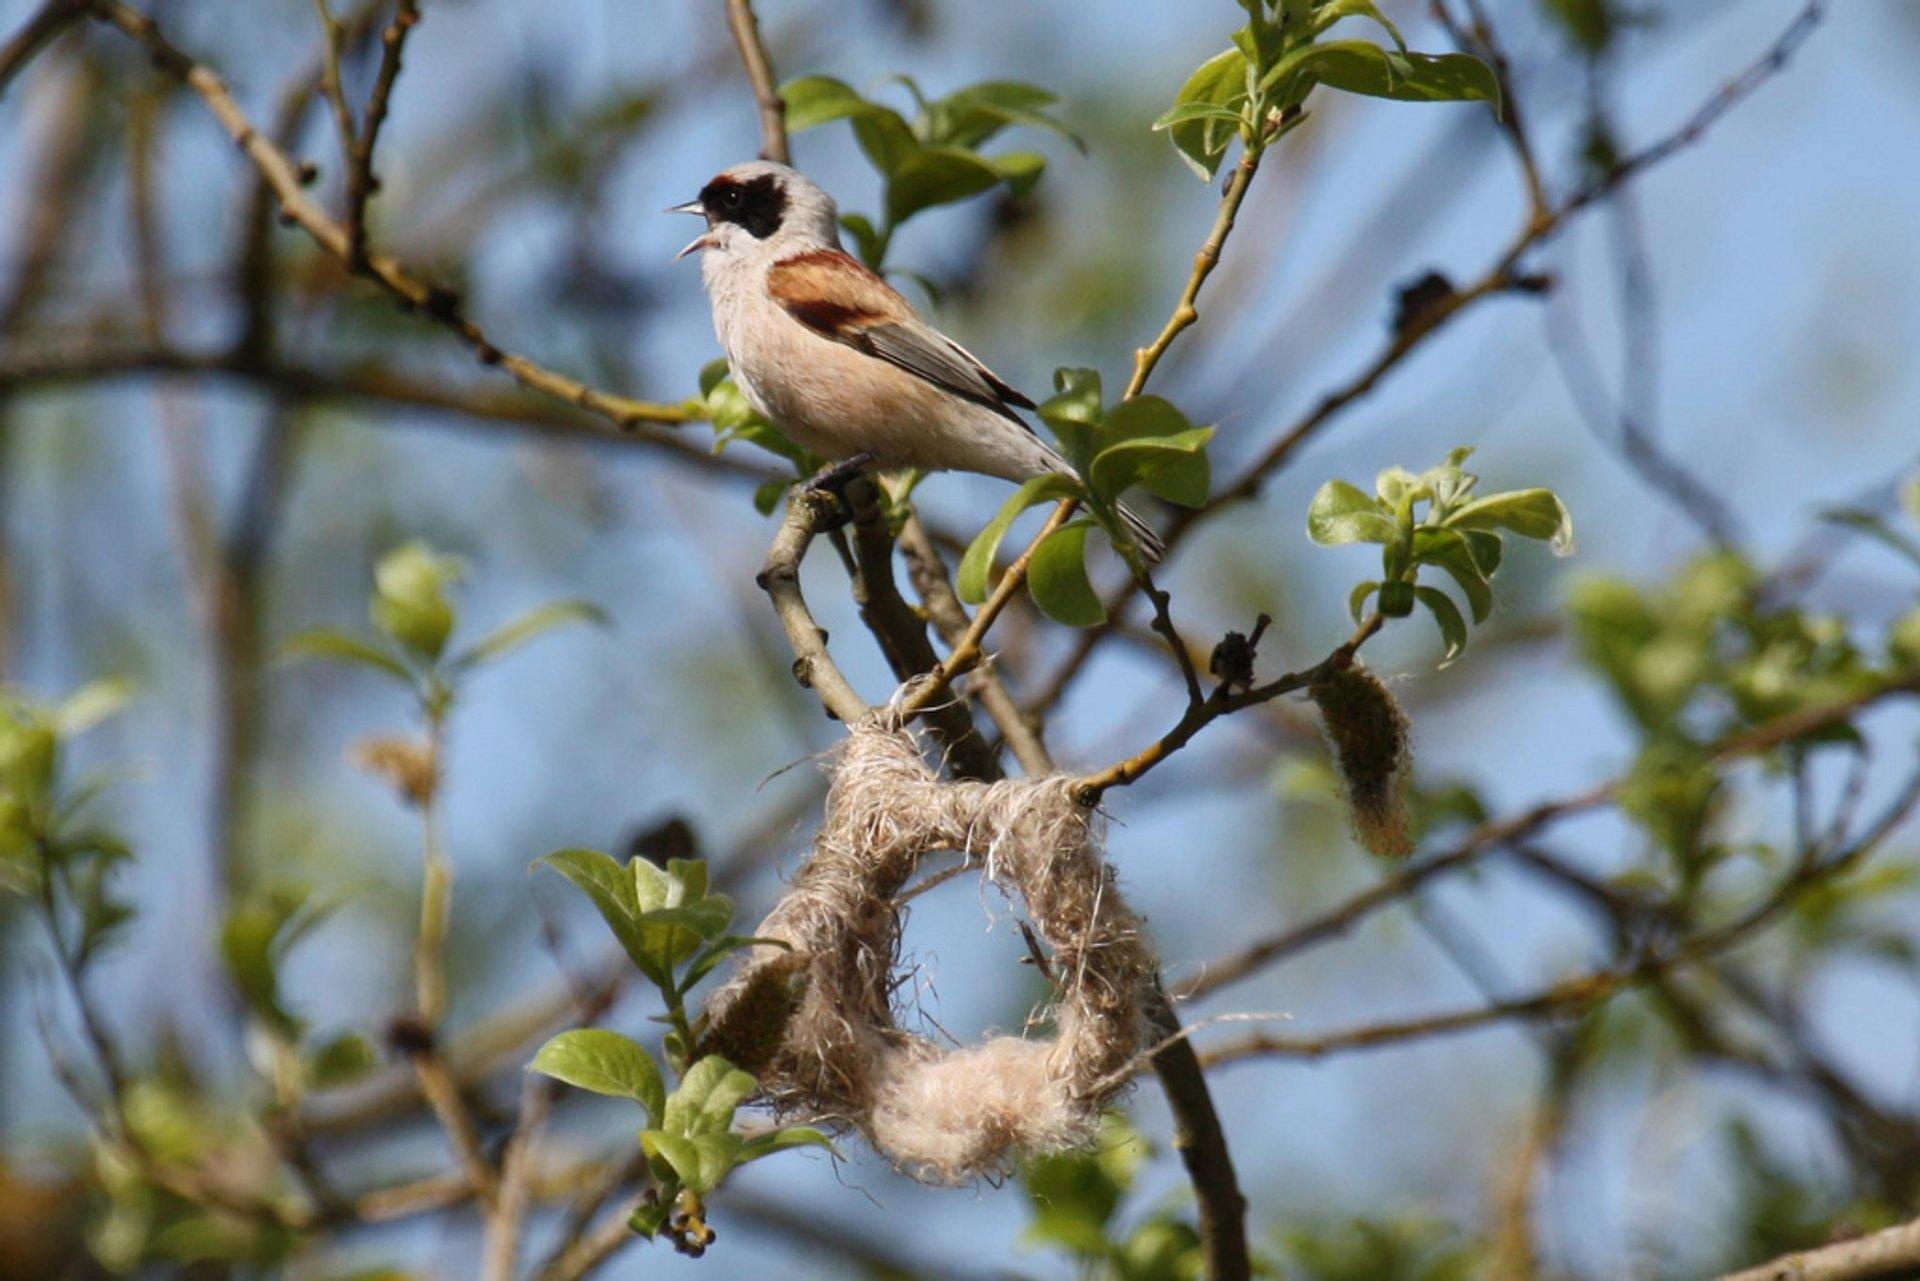 Penduline Tit nest building 2020